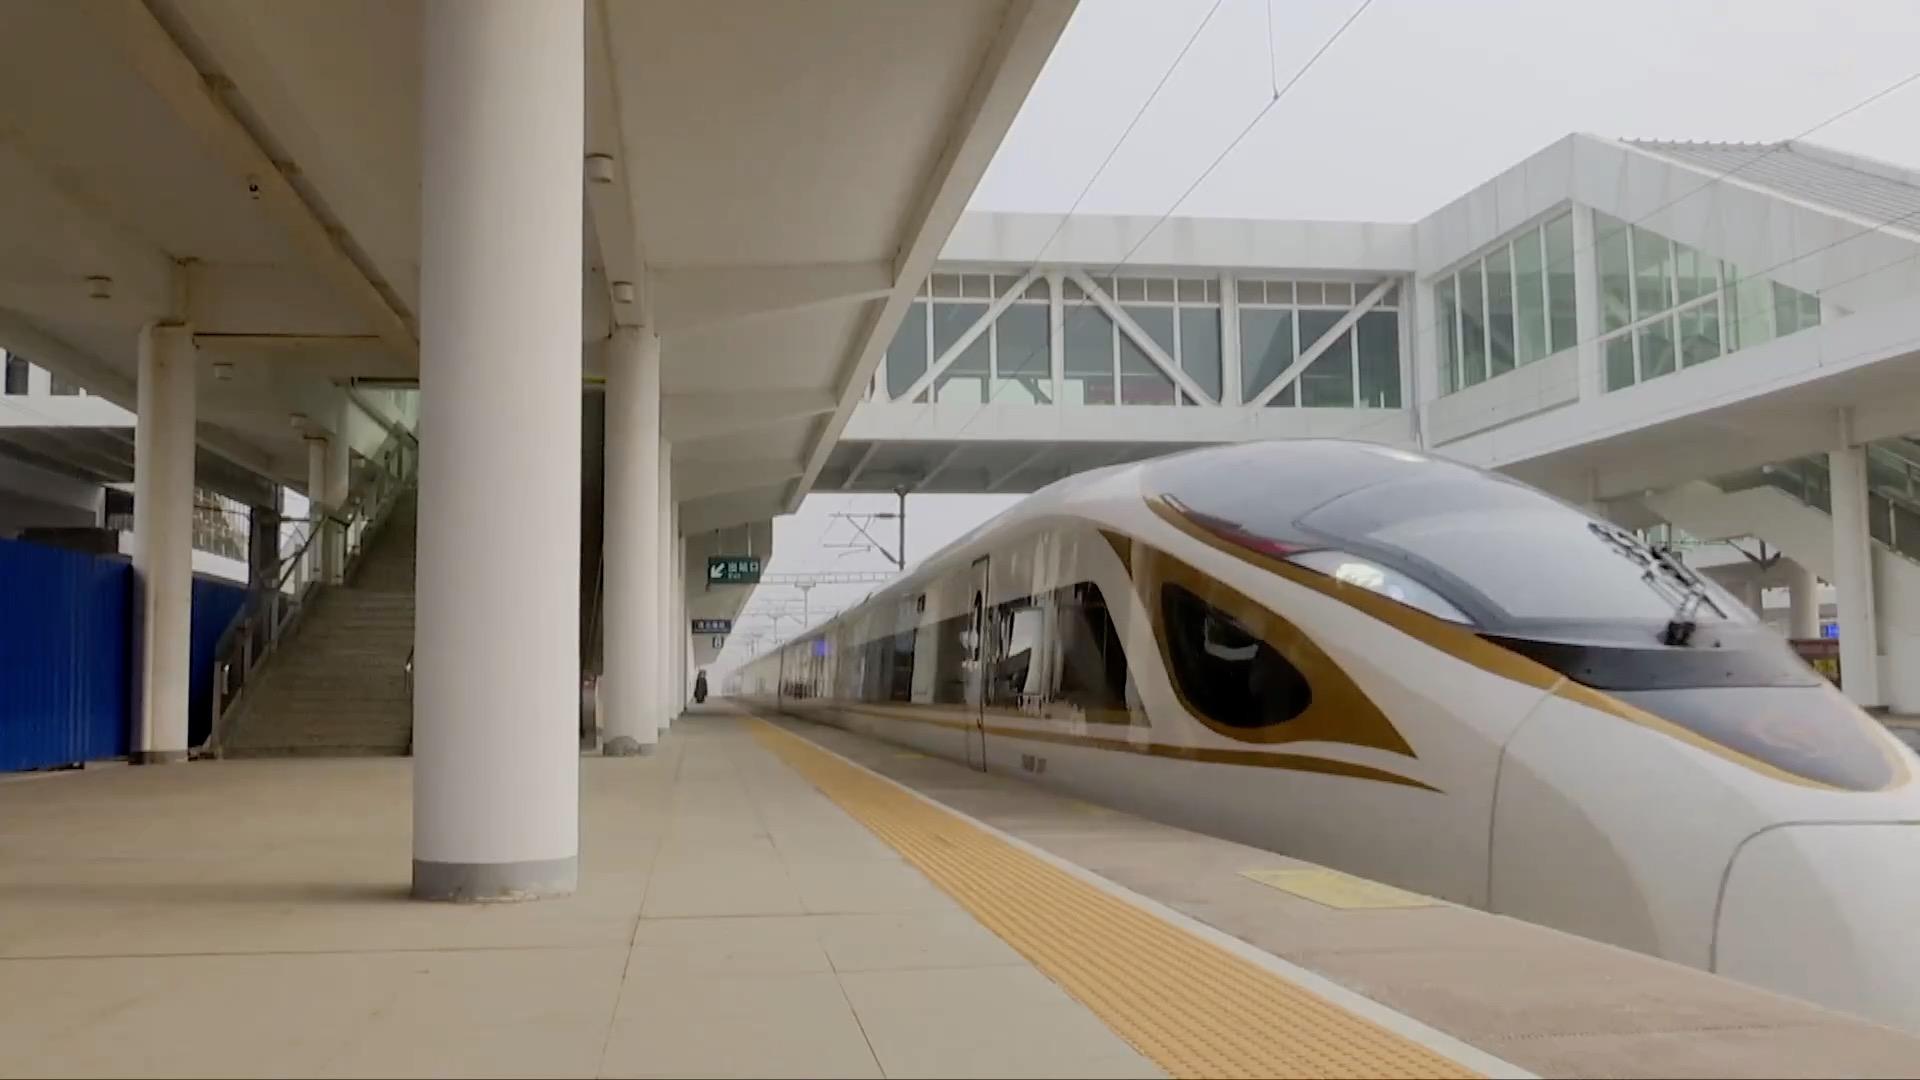 New high-speed rail line fully put into operation in Jiangsu, China